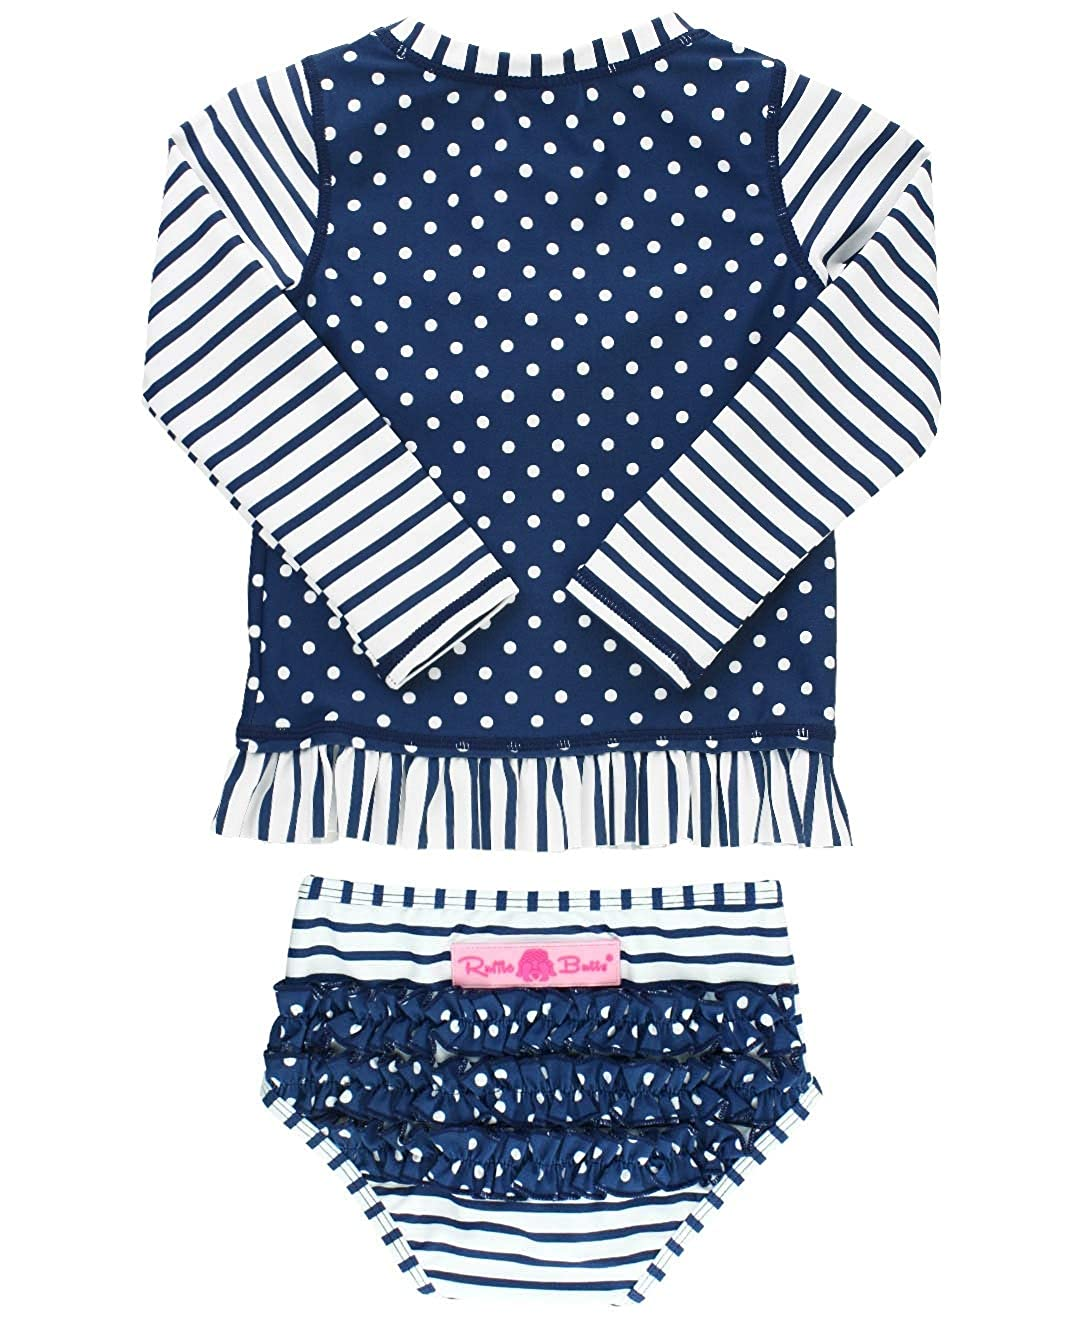 RuffleButts Baby//Toddler Girls Long Sleeve Rash Guard 2-Piece Swimsuit Set Stripes Polka with UPF 50 Sun Protection RGSYYXX-LSP2-SC-BABY